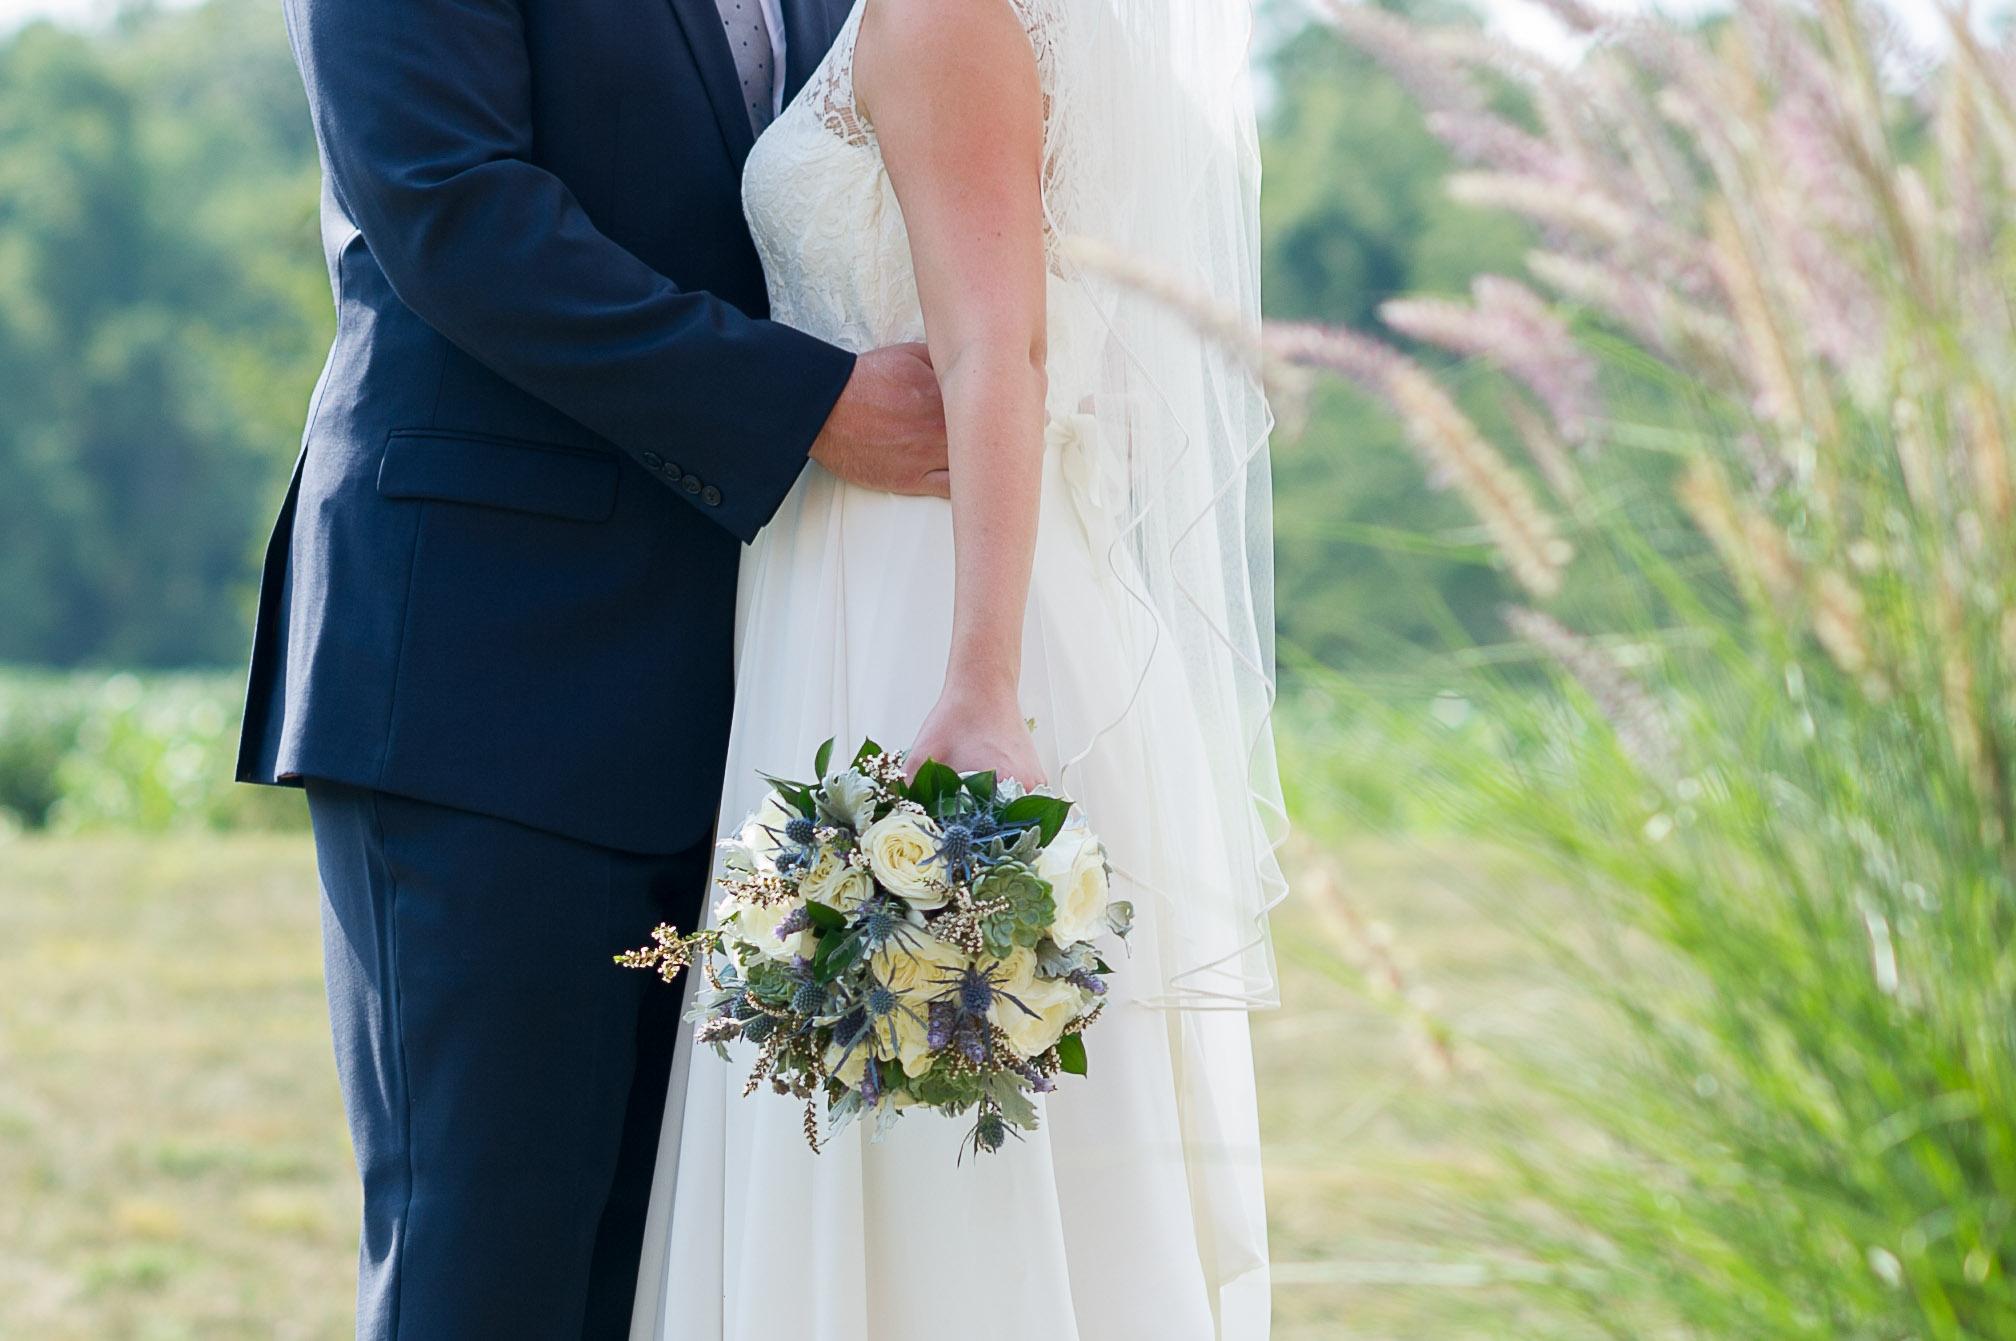 brandywine-wedding-tessie-reveliotis-photography-beautiful-and-blessed-events-007